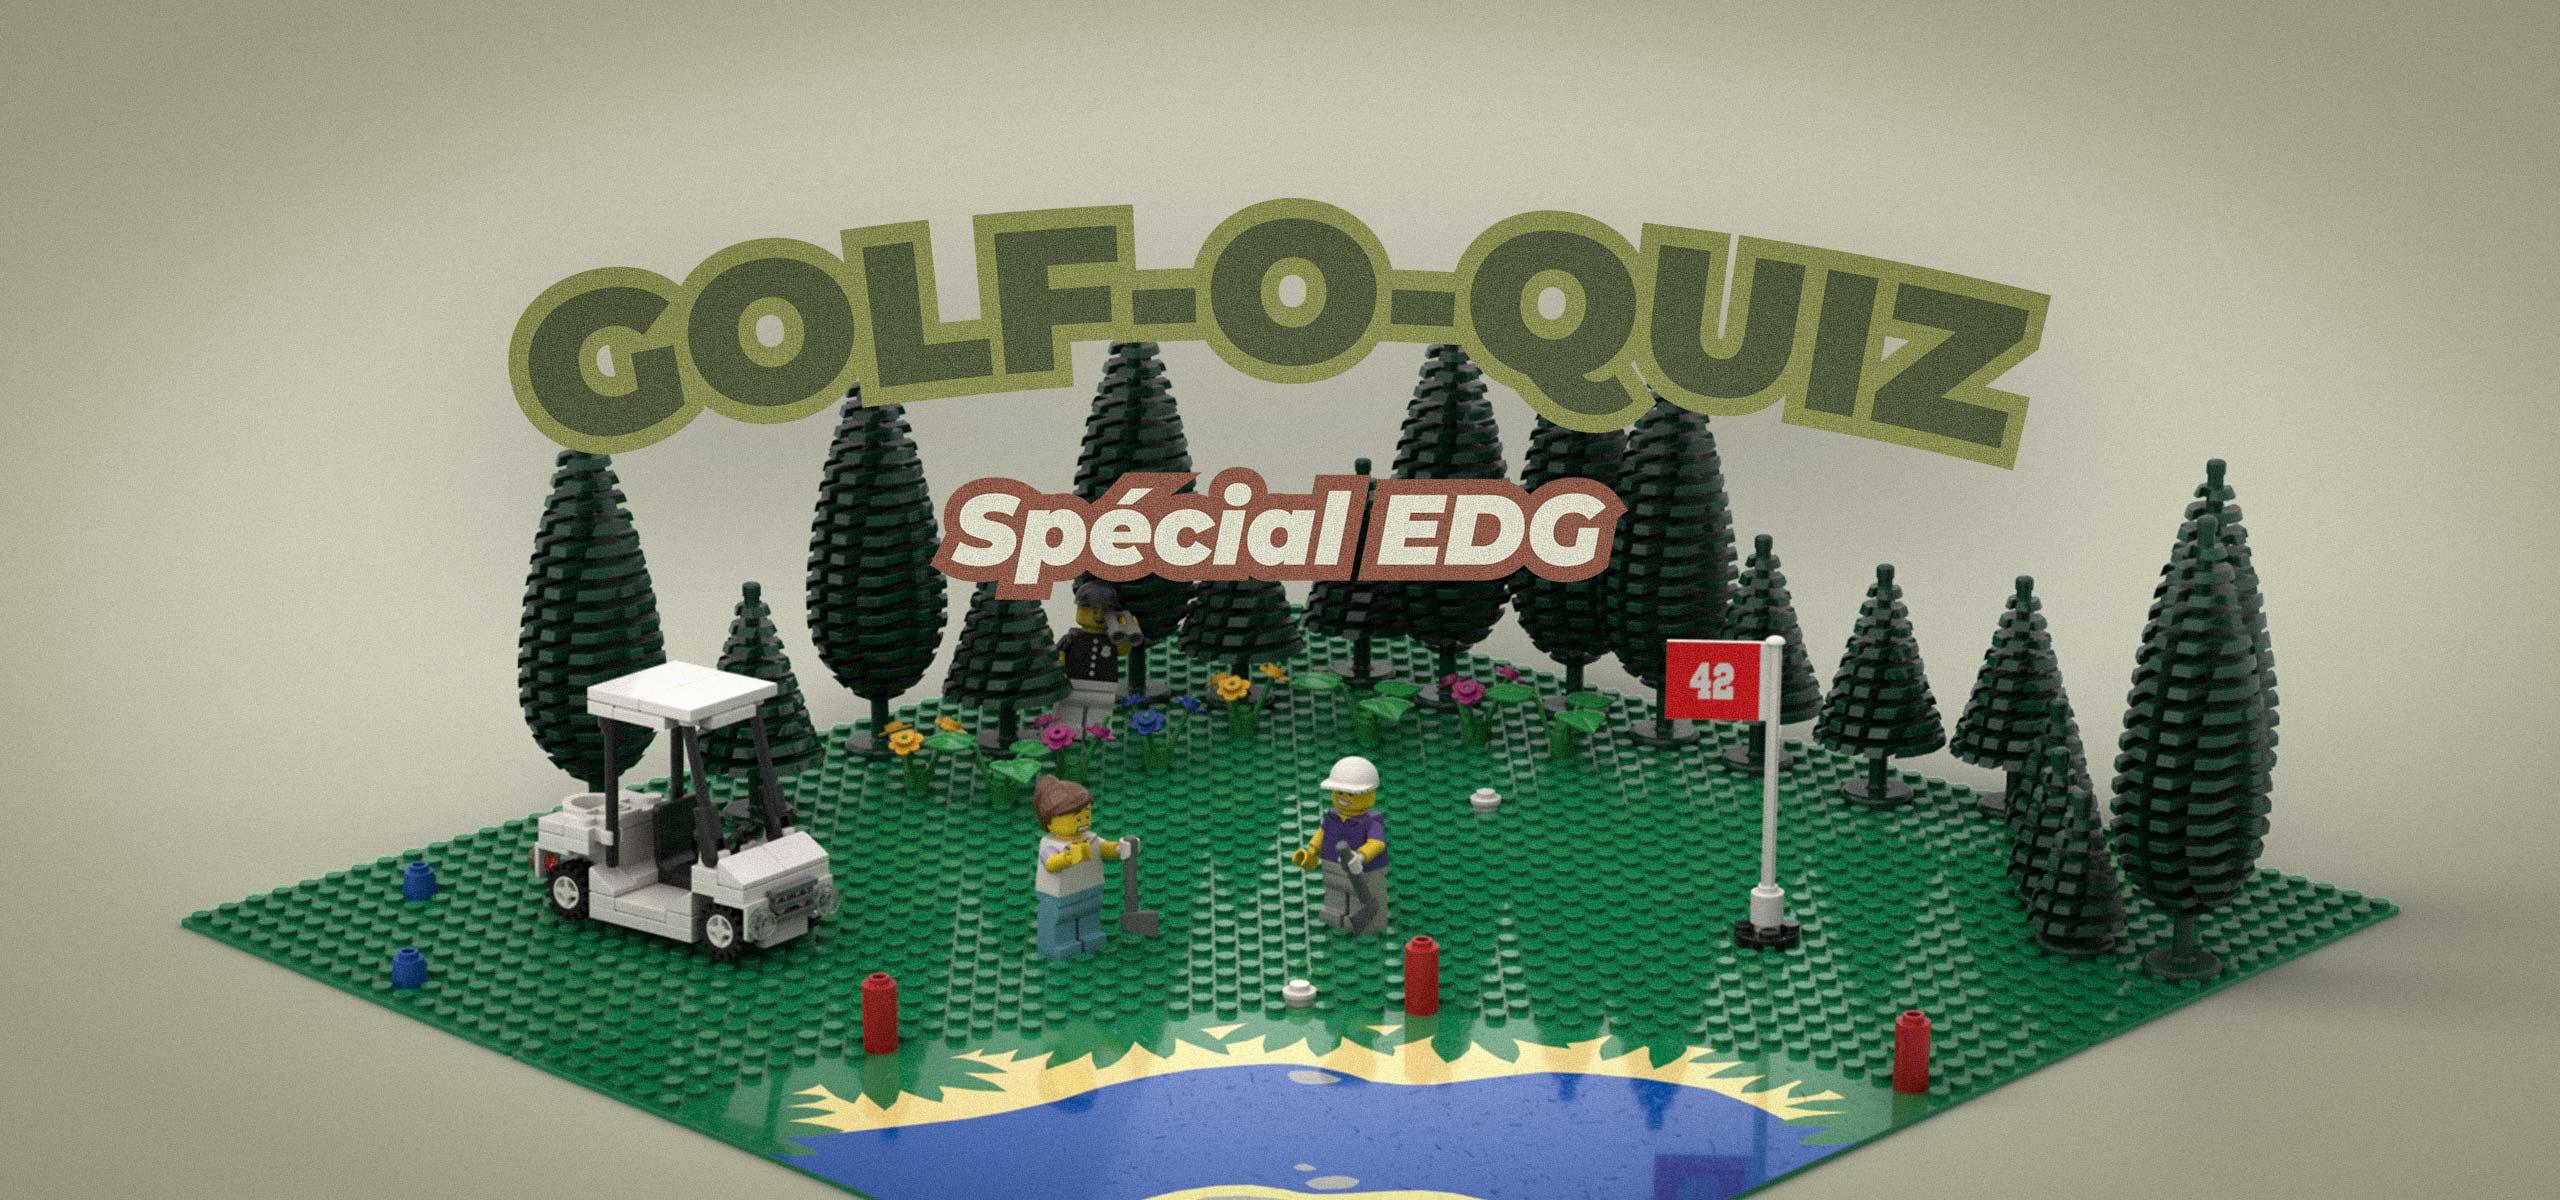 Golf O Quizz Special Edg 2021 Header